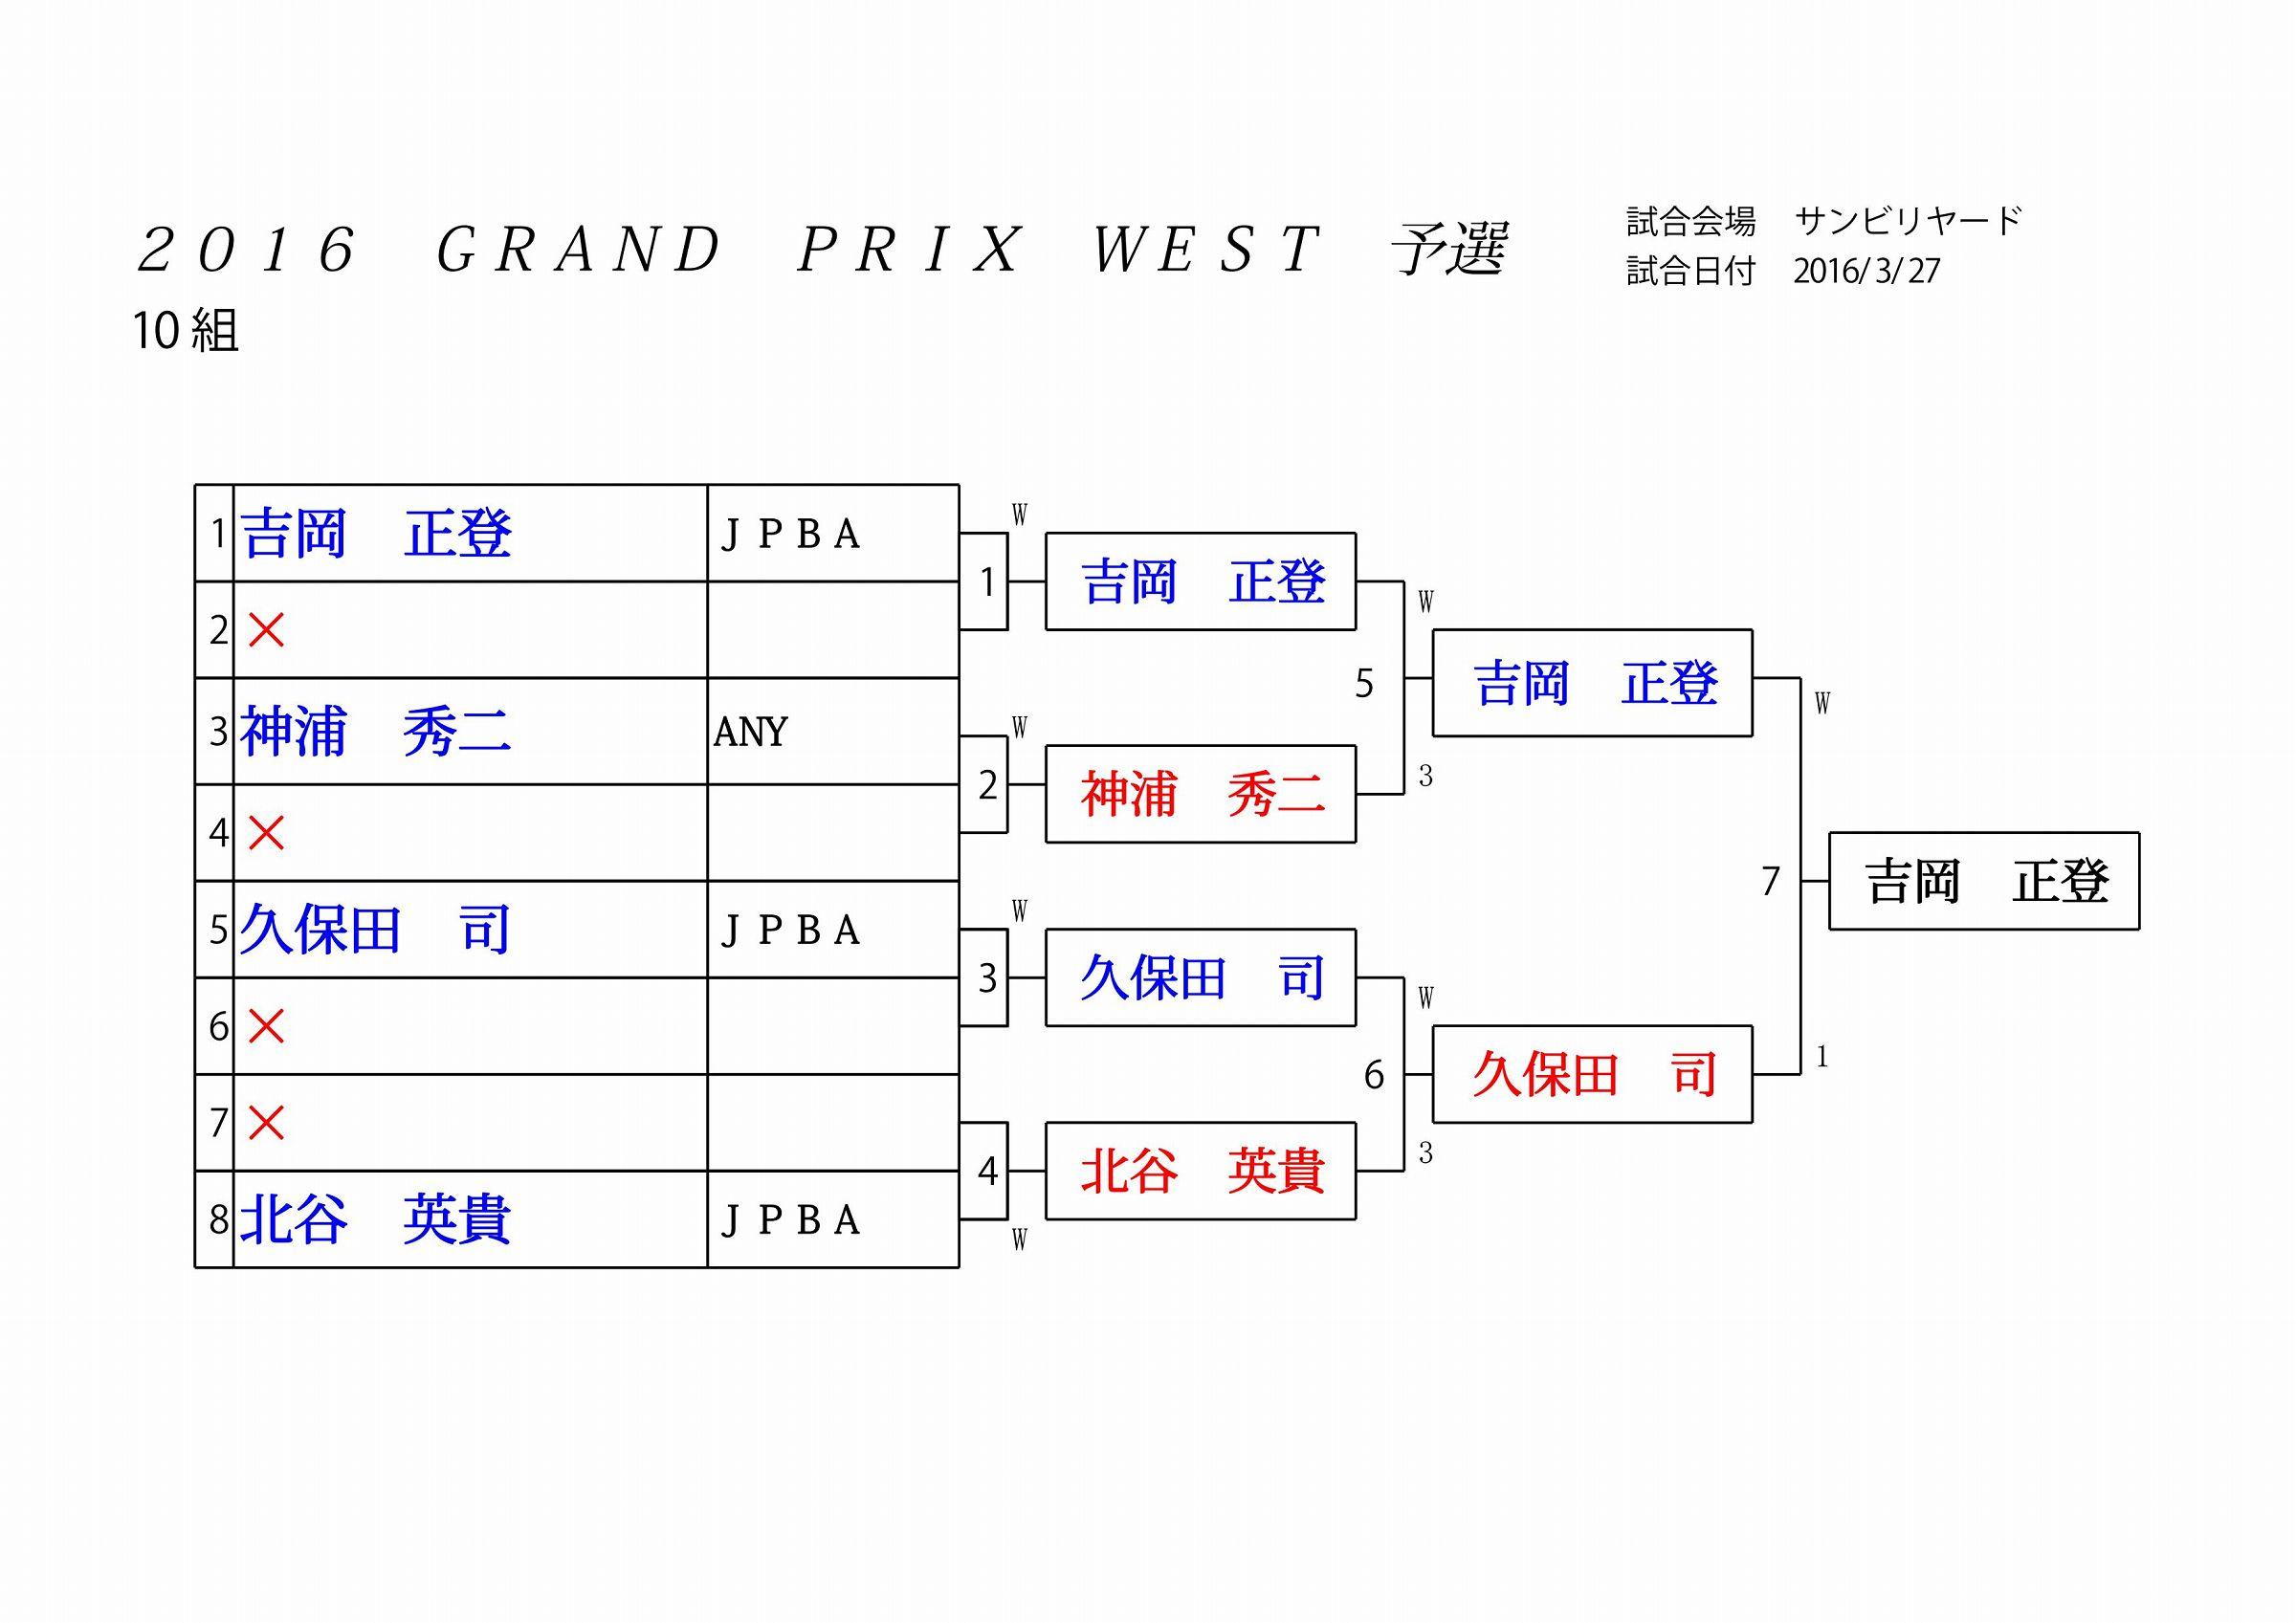 2016 GRAND PRIX WEST 予選_10